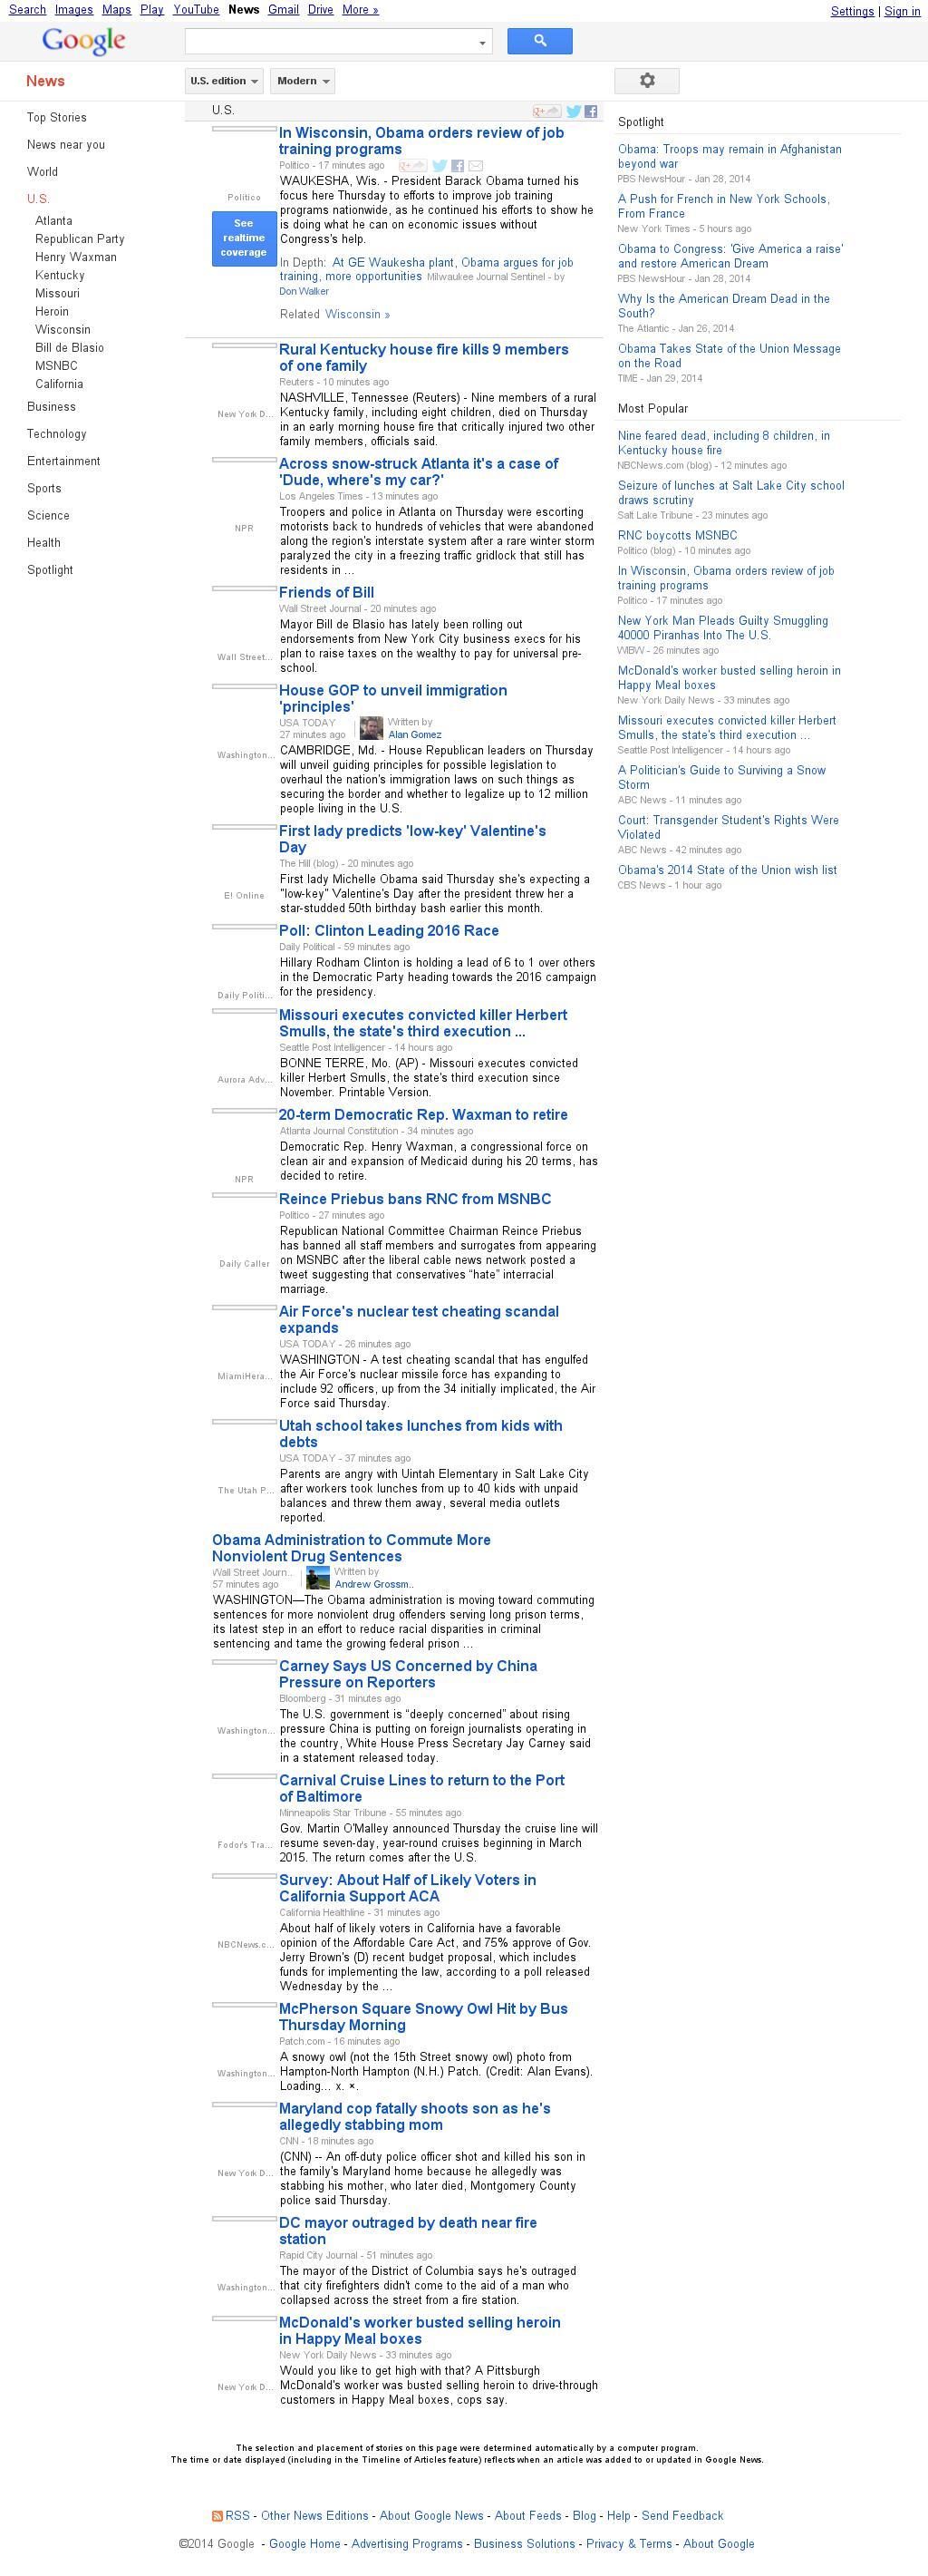 Google News: U.S. at Thursday Jan. 30, 2014, 7:09 p.m. UTC